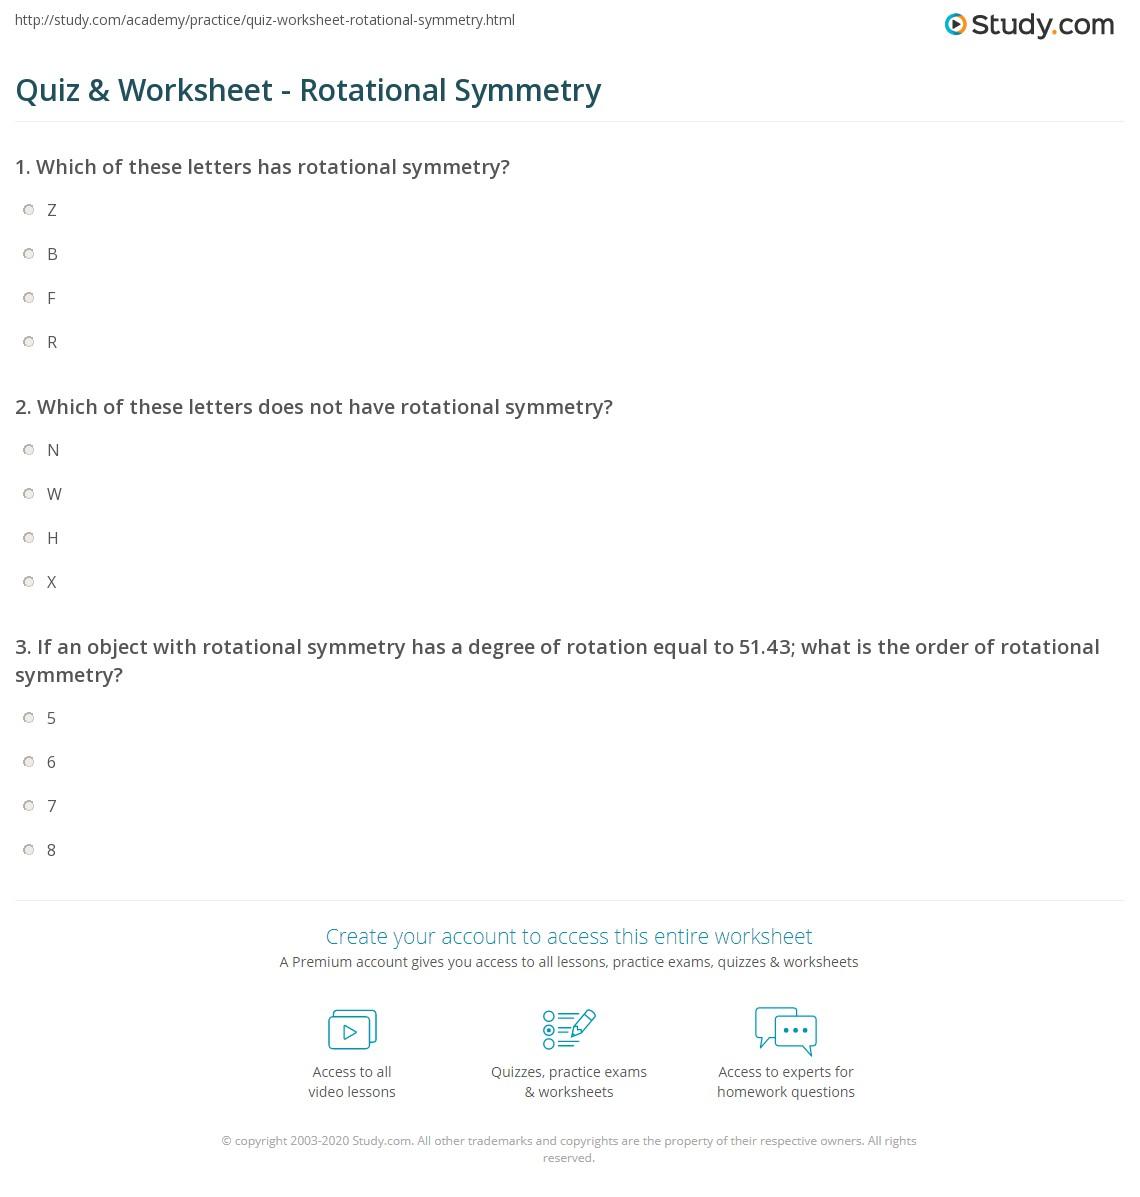 math worksheet : maths rotational symmetry worksheets  quiz worksheet rotational  : Maths Symmetry Worksheets